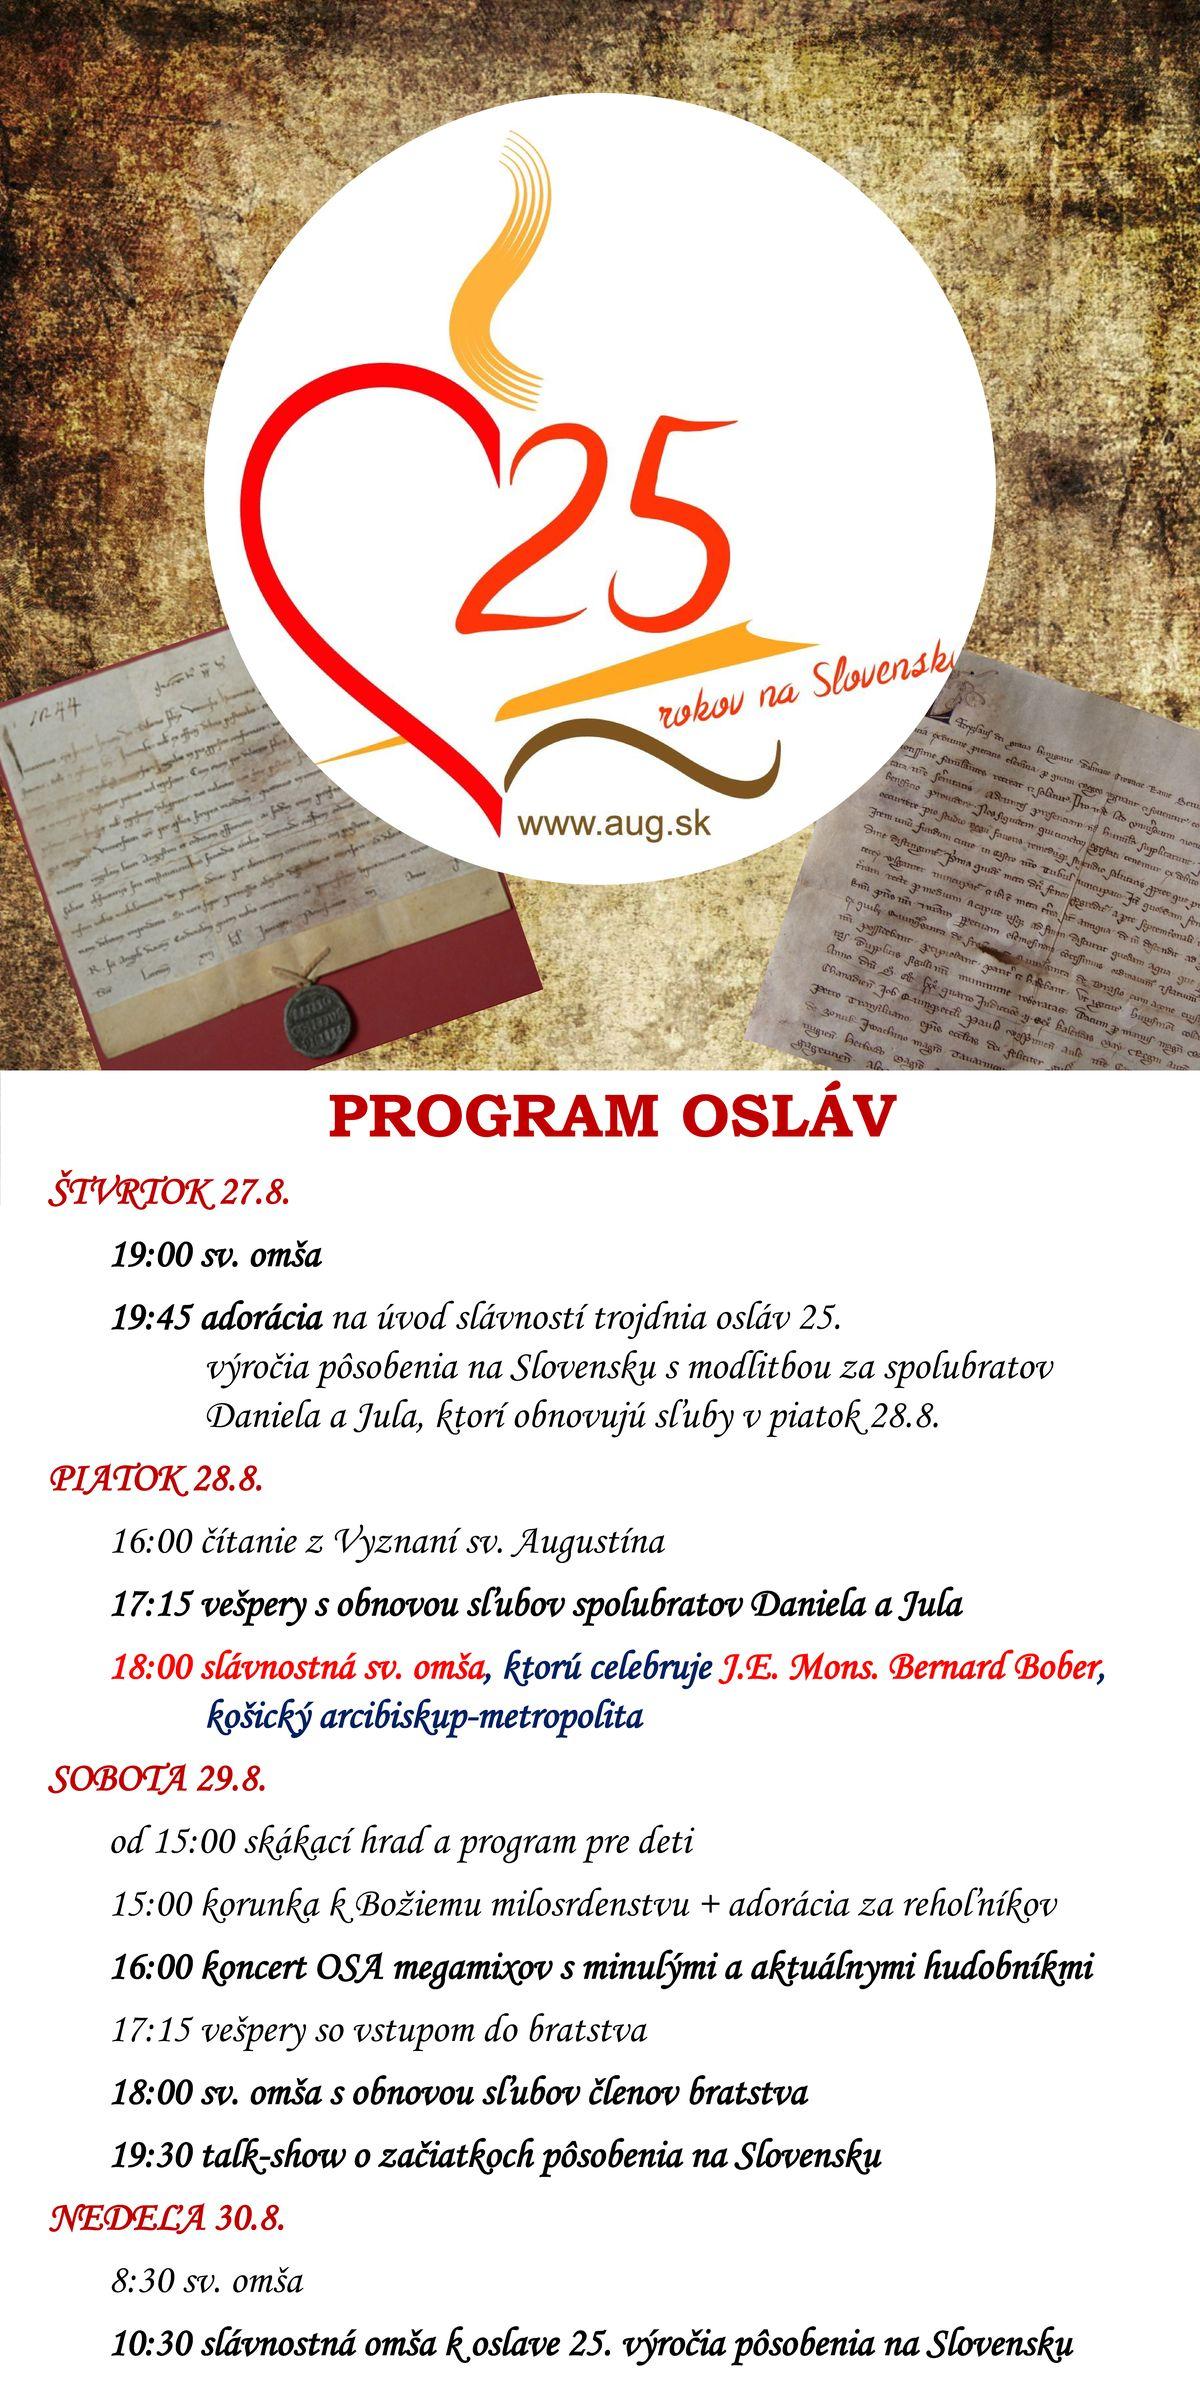 20200823 - Kostol sv Rity, ke - Oznamy 25tka OSA Sk aug.sk